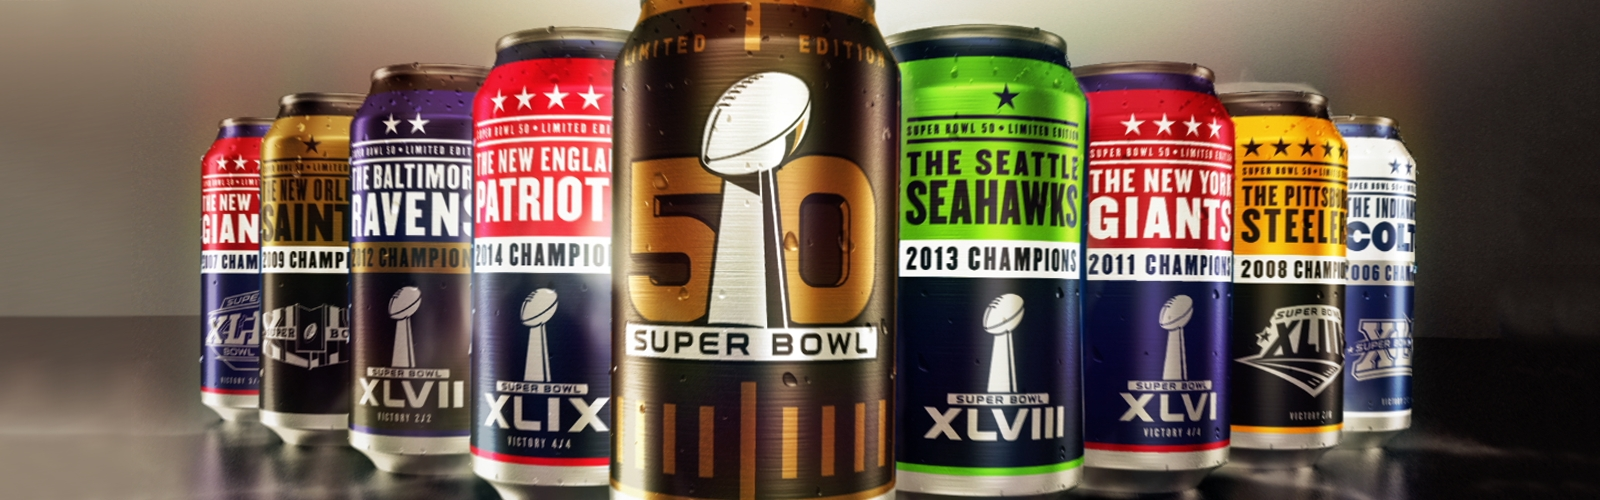 Beer Giant Confirms Super Bowl Sponsorship regarding Bud Light Super Bowl